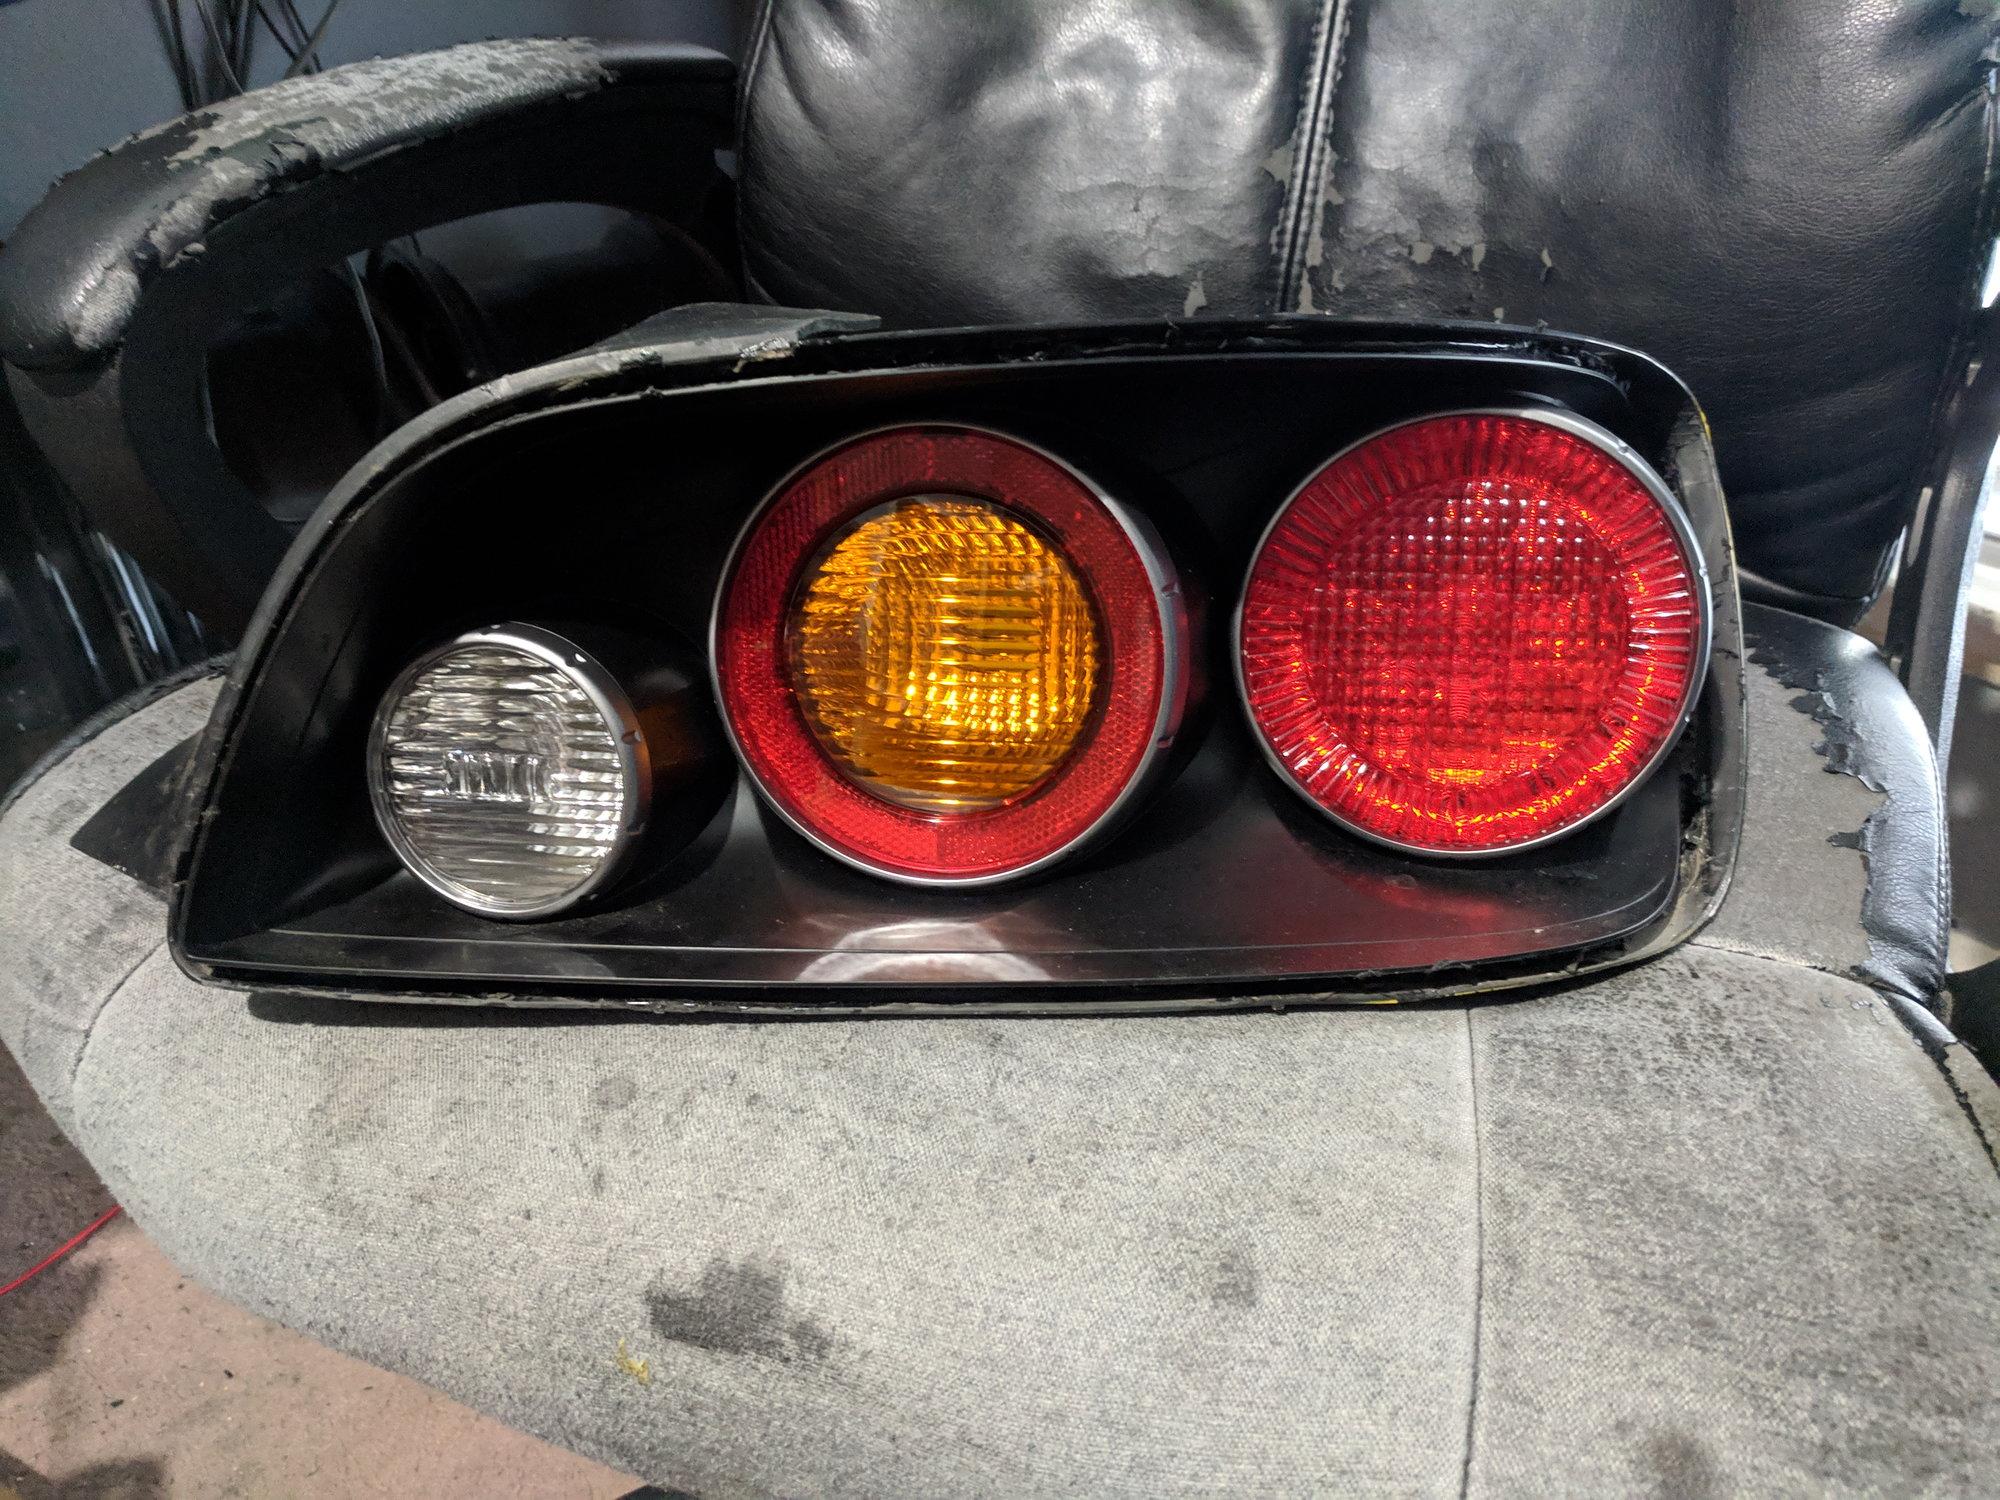 TX: FS - Broken Ap2 passenger side tail light - S2KI Honda S2000 Forums